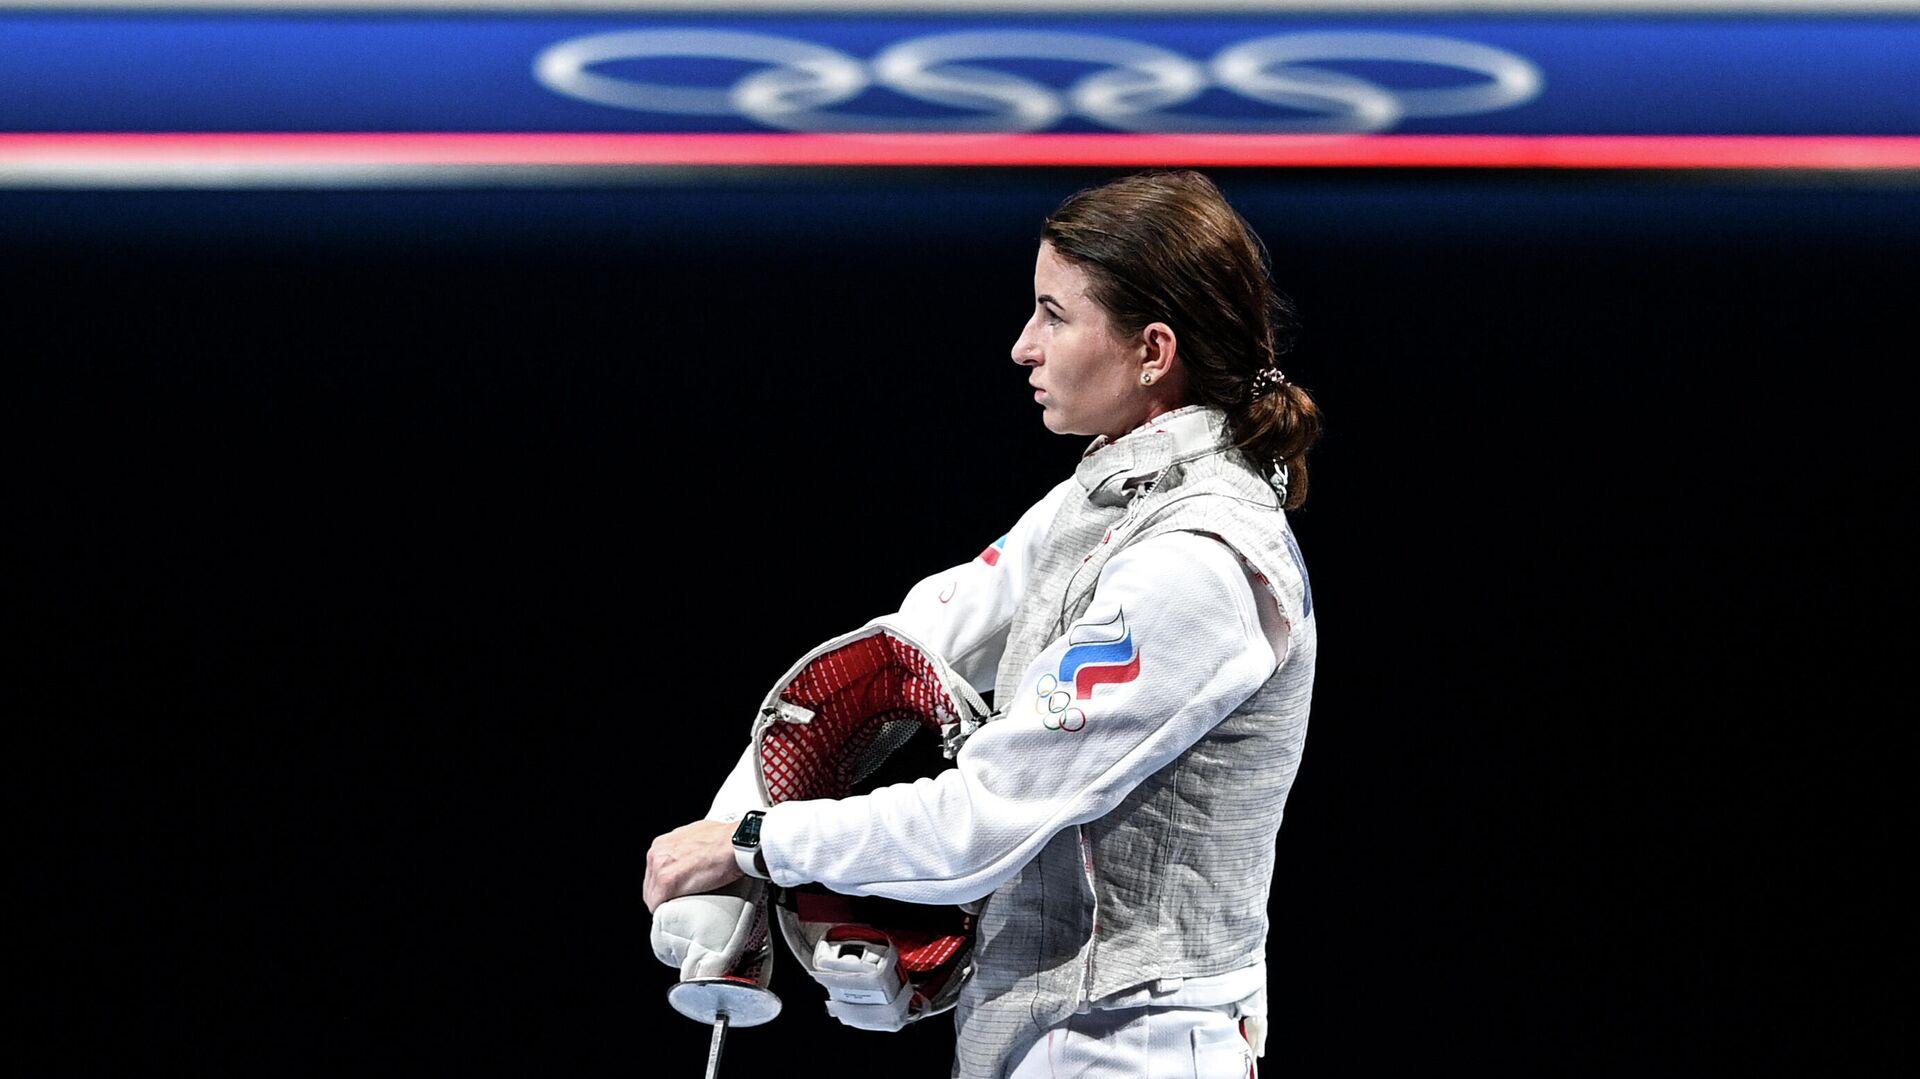 Олимпиада-2020. Фехтование. Женщины. Рапира - РИА Новости, 1920, 25.07.2021